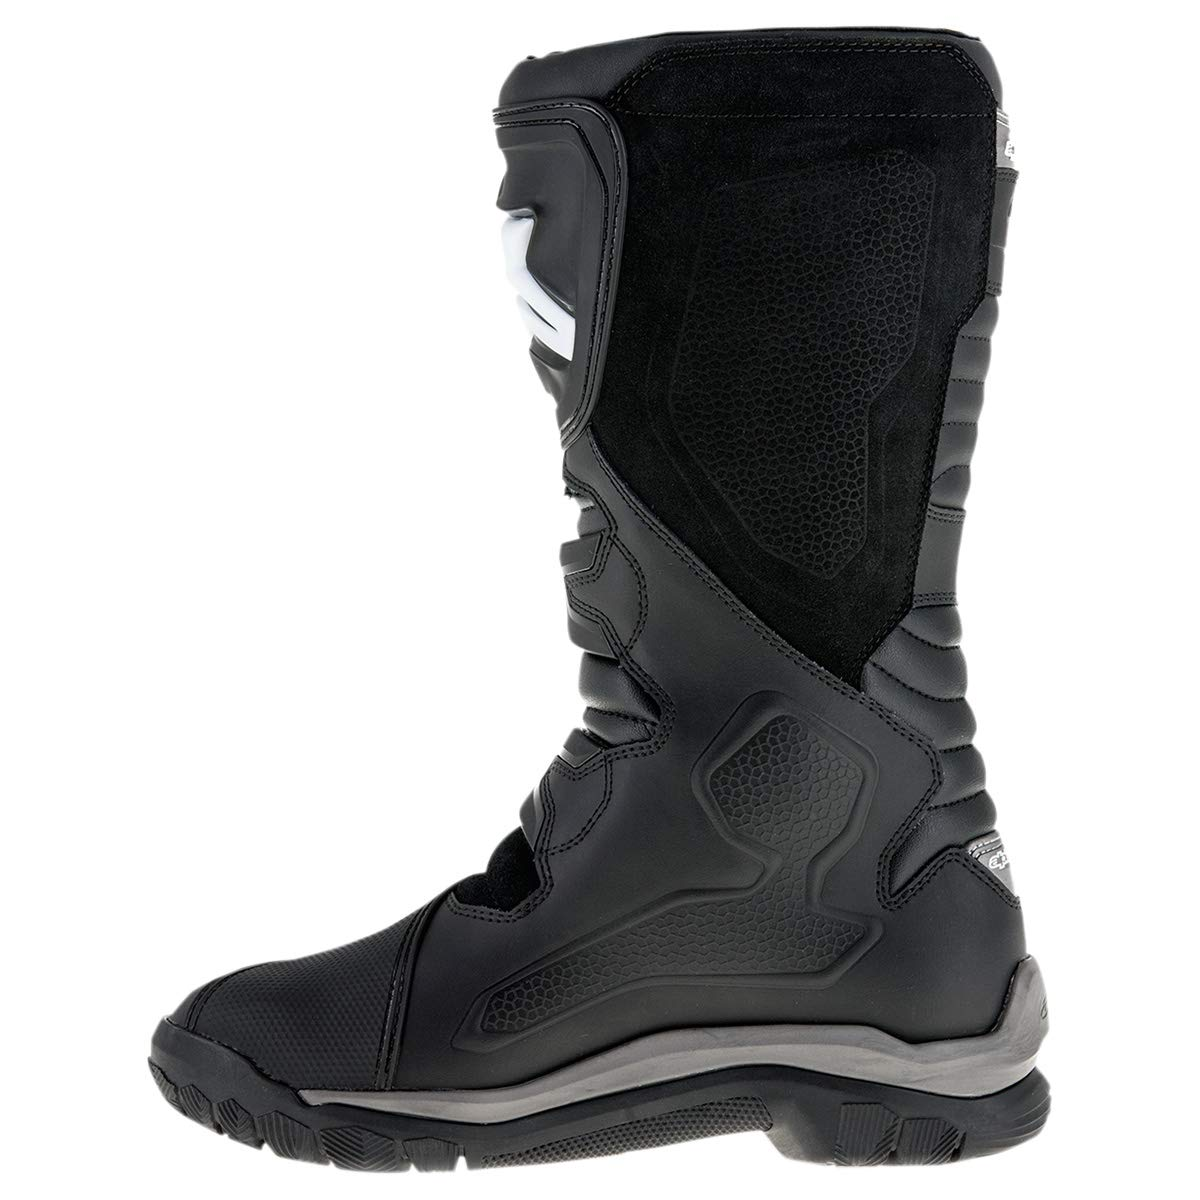 Black, US Size 10 Alpinestars Corozal Adventure Drystar Mens Motorcycle Touring Boots